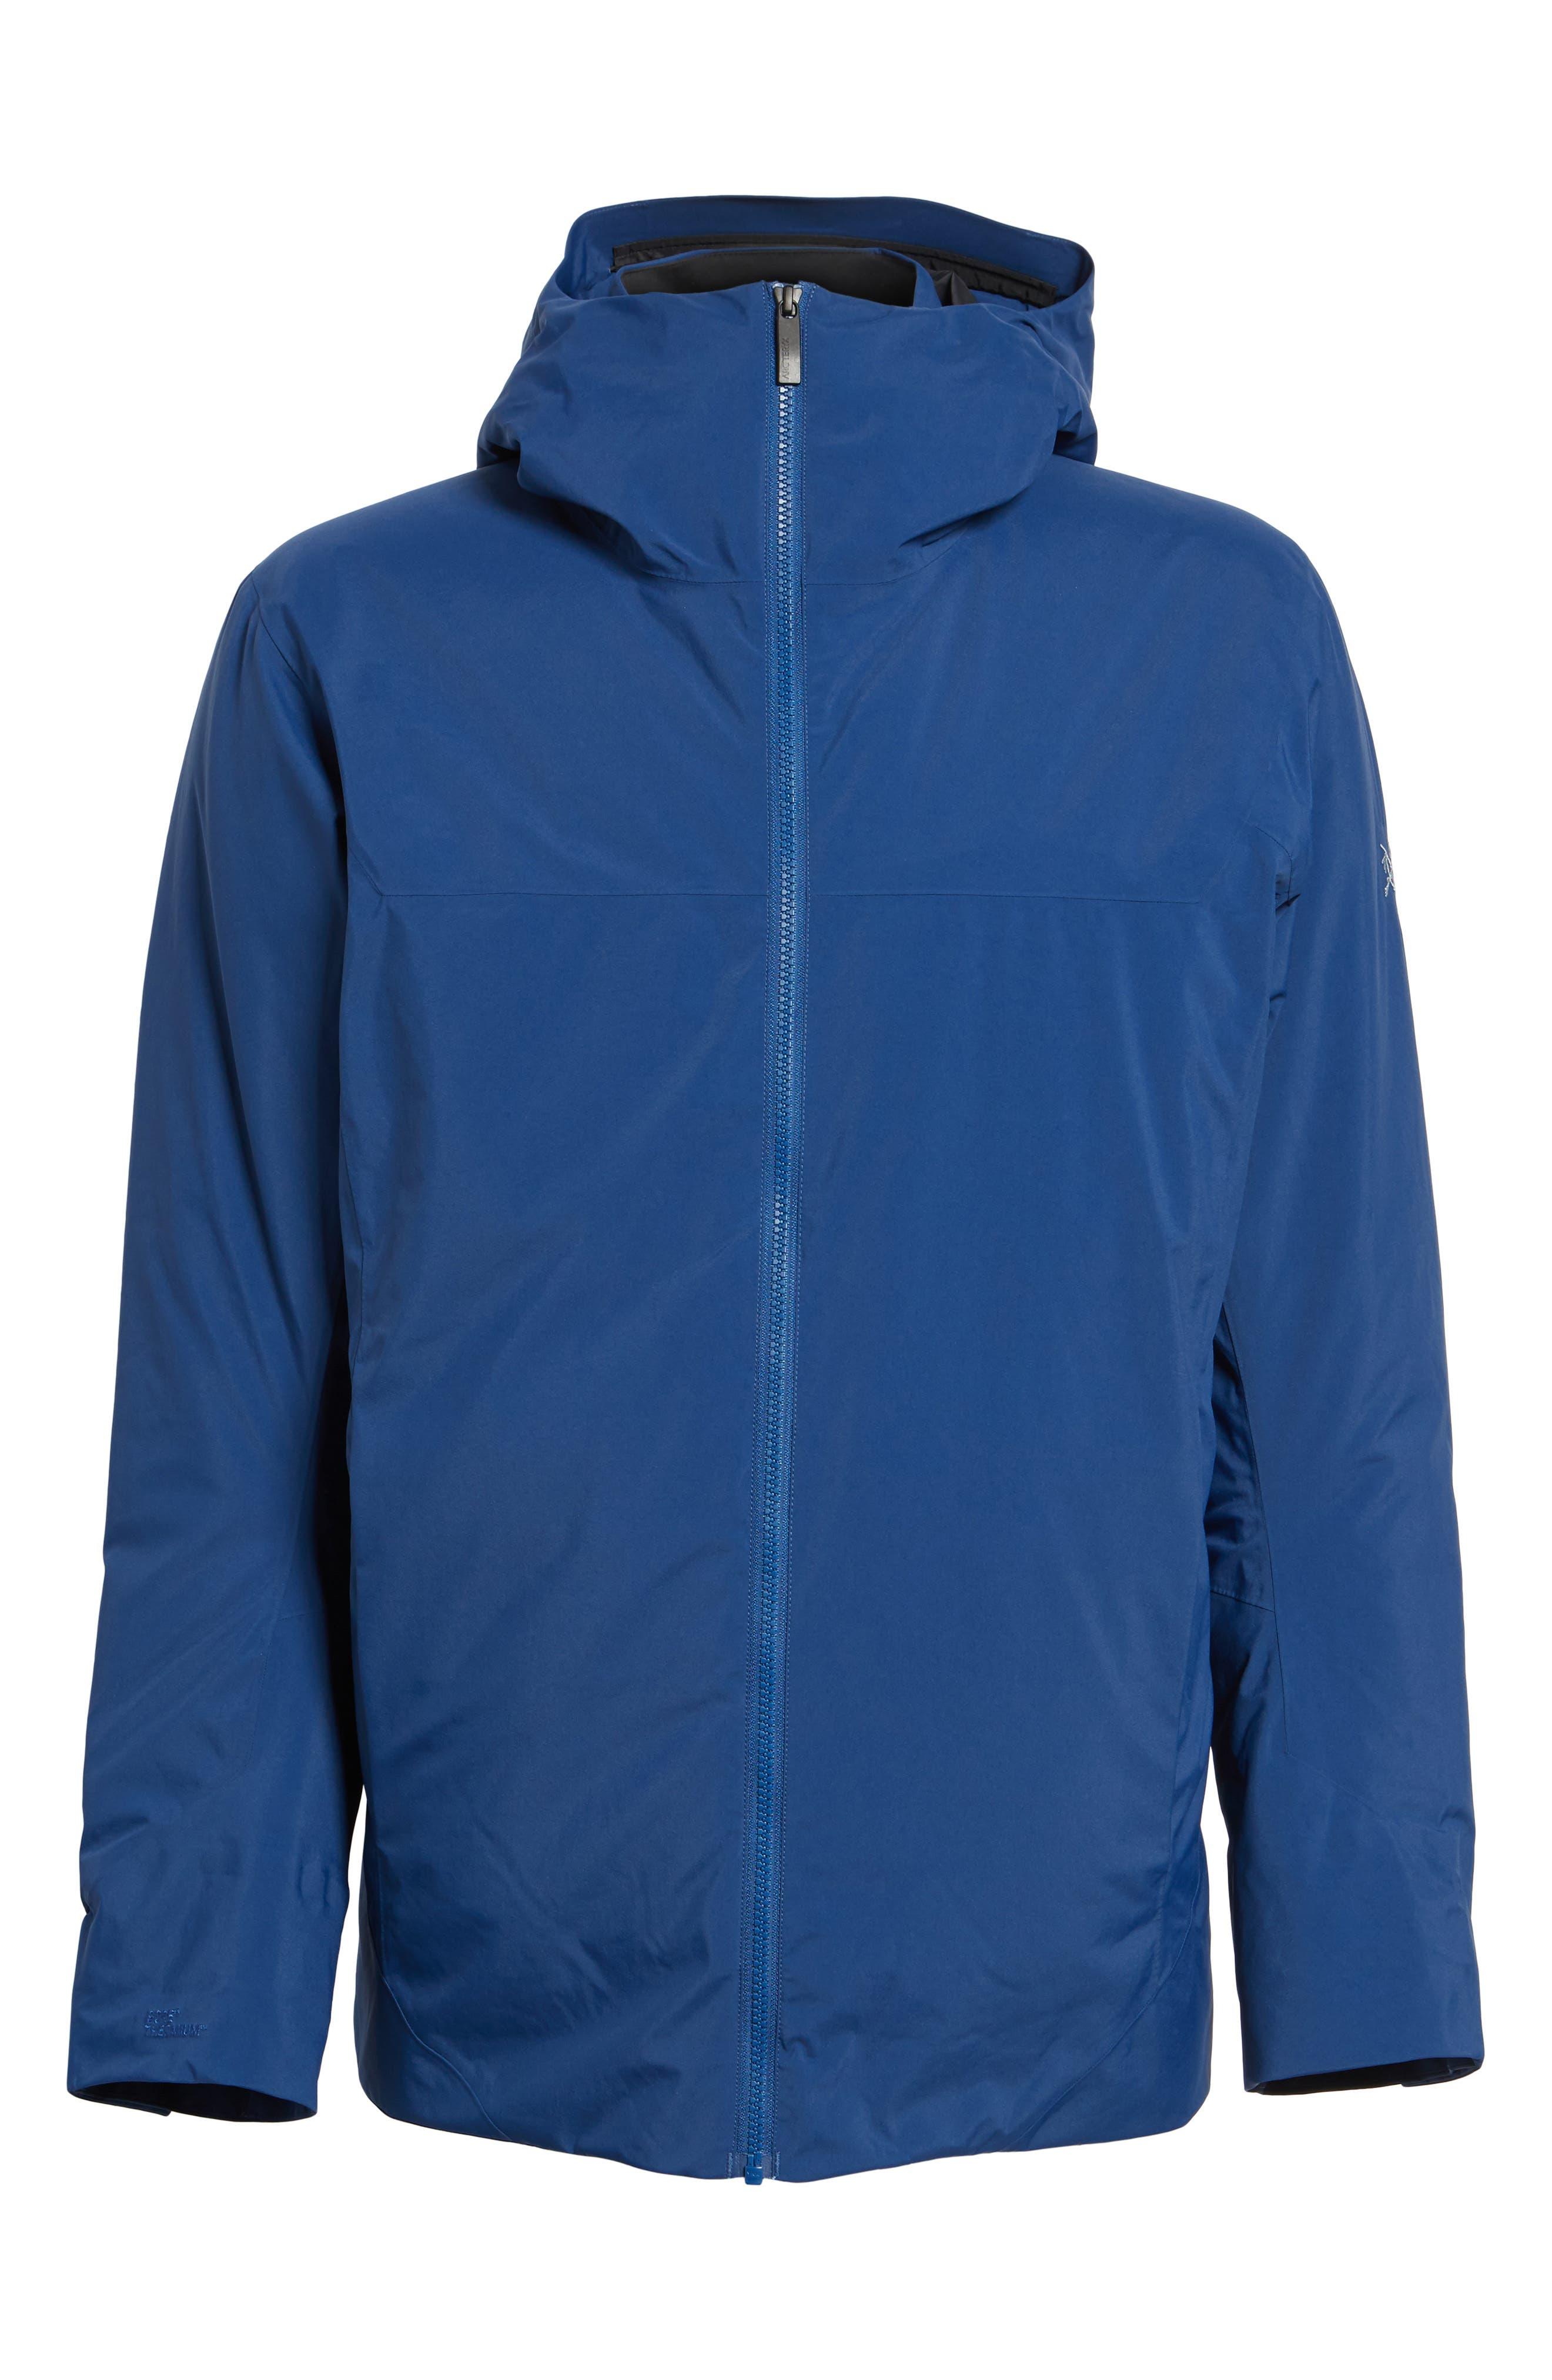 'Koda' Hooded Waterproof Shell Jacket,                             Alternate thumbnail 5, color,                             400